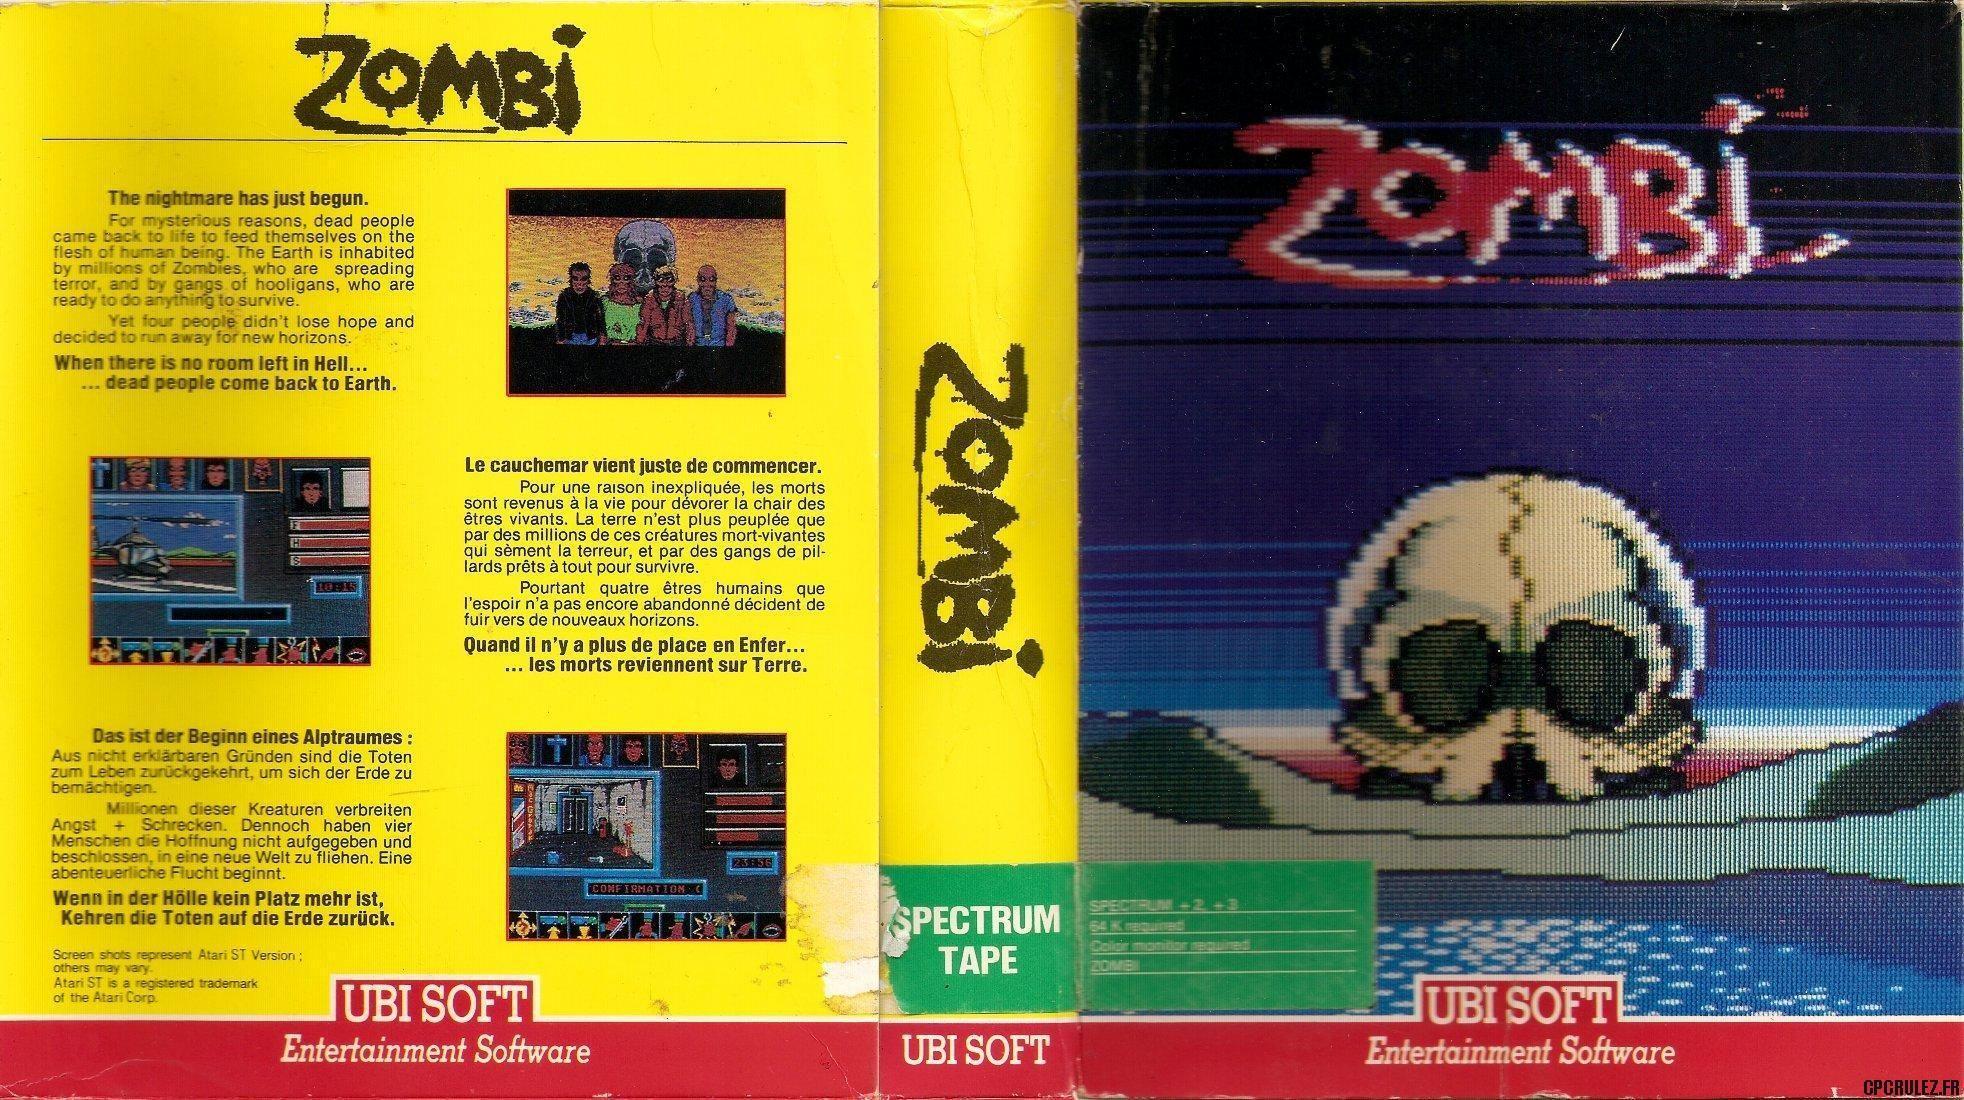 Zombi 1986 Ubisoft Entertaining Playbill